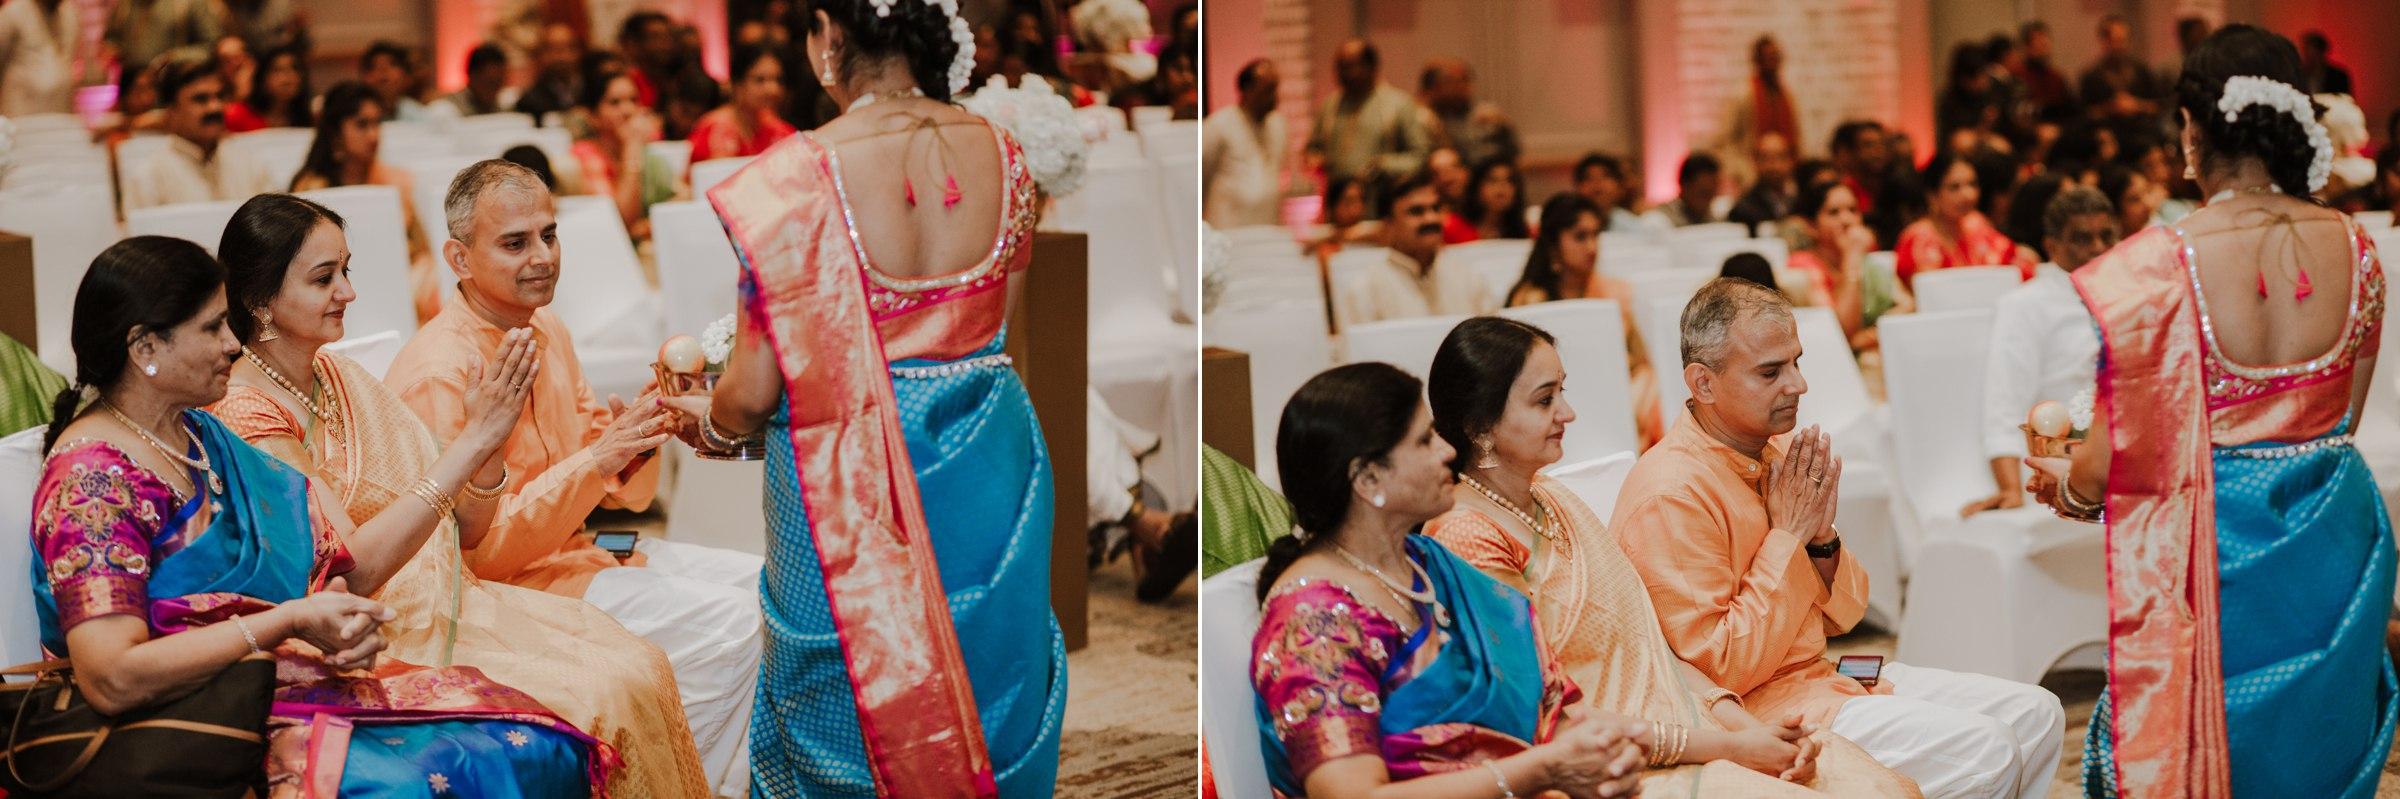 indian wedding minneapolis minnesota texas austin wedding elopement destination intimate best photographer_0032.jpg